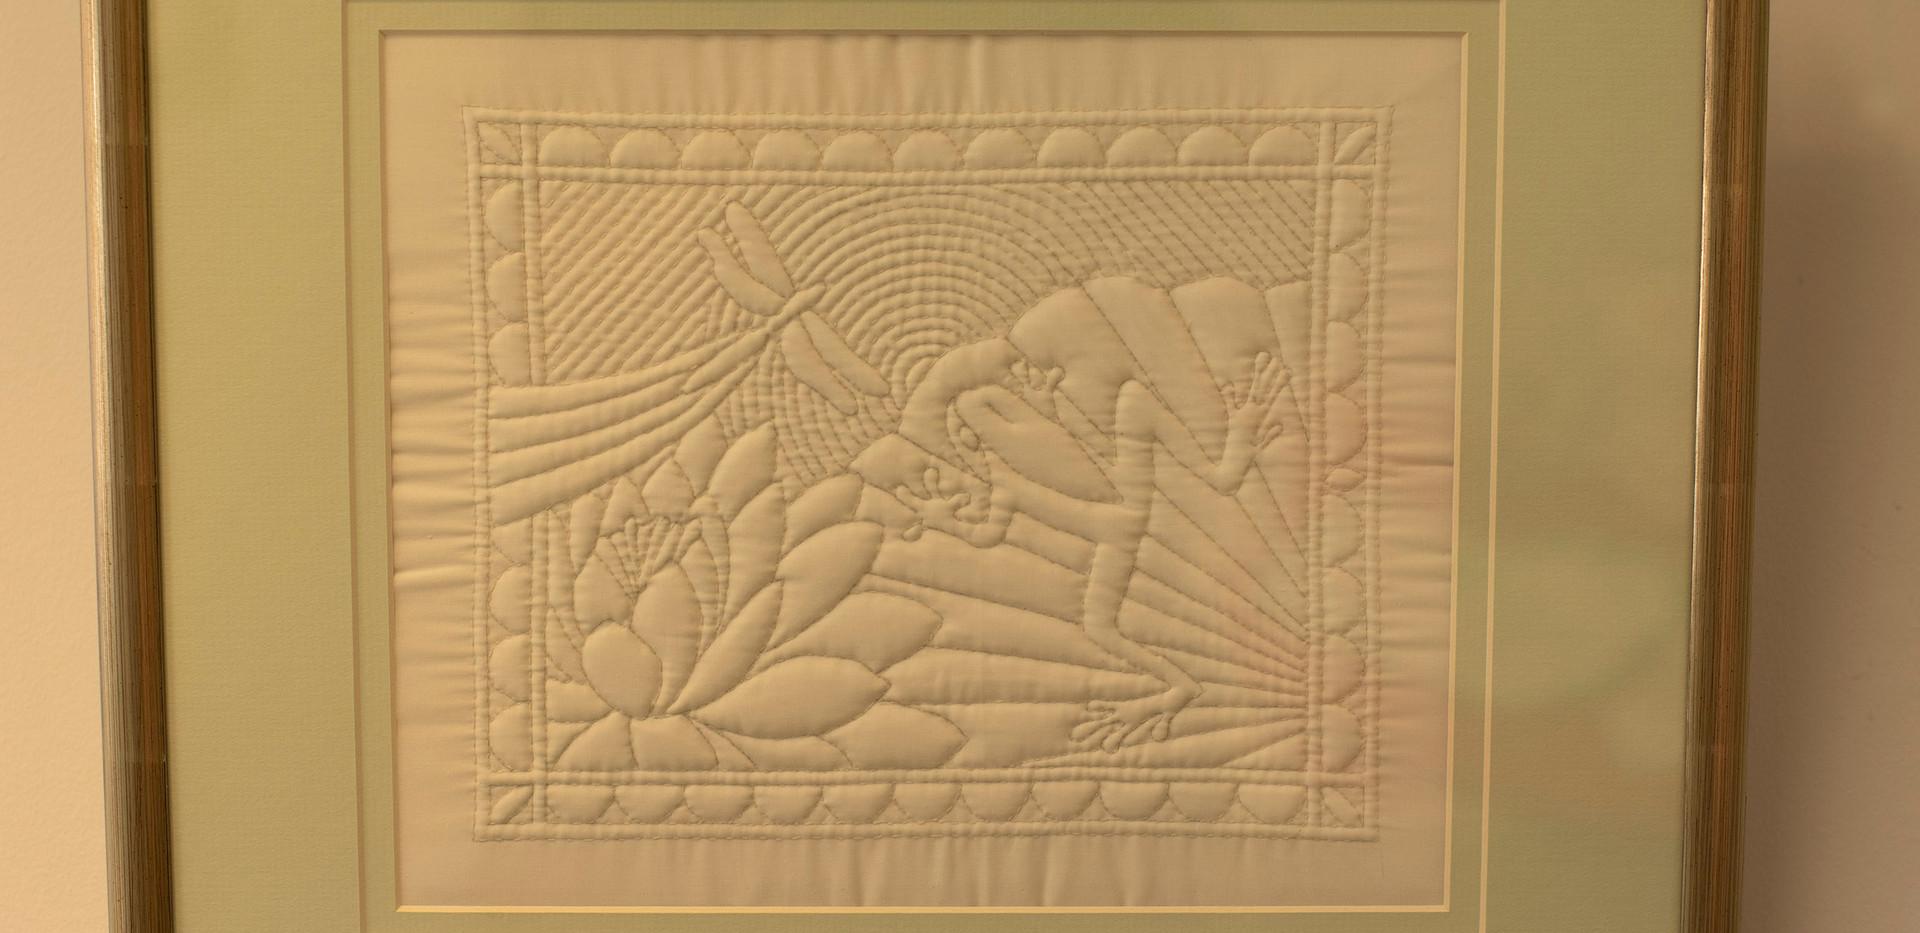 Trapunto Embroidery - Millmerran Arts and Crafts